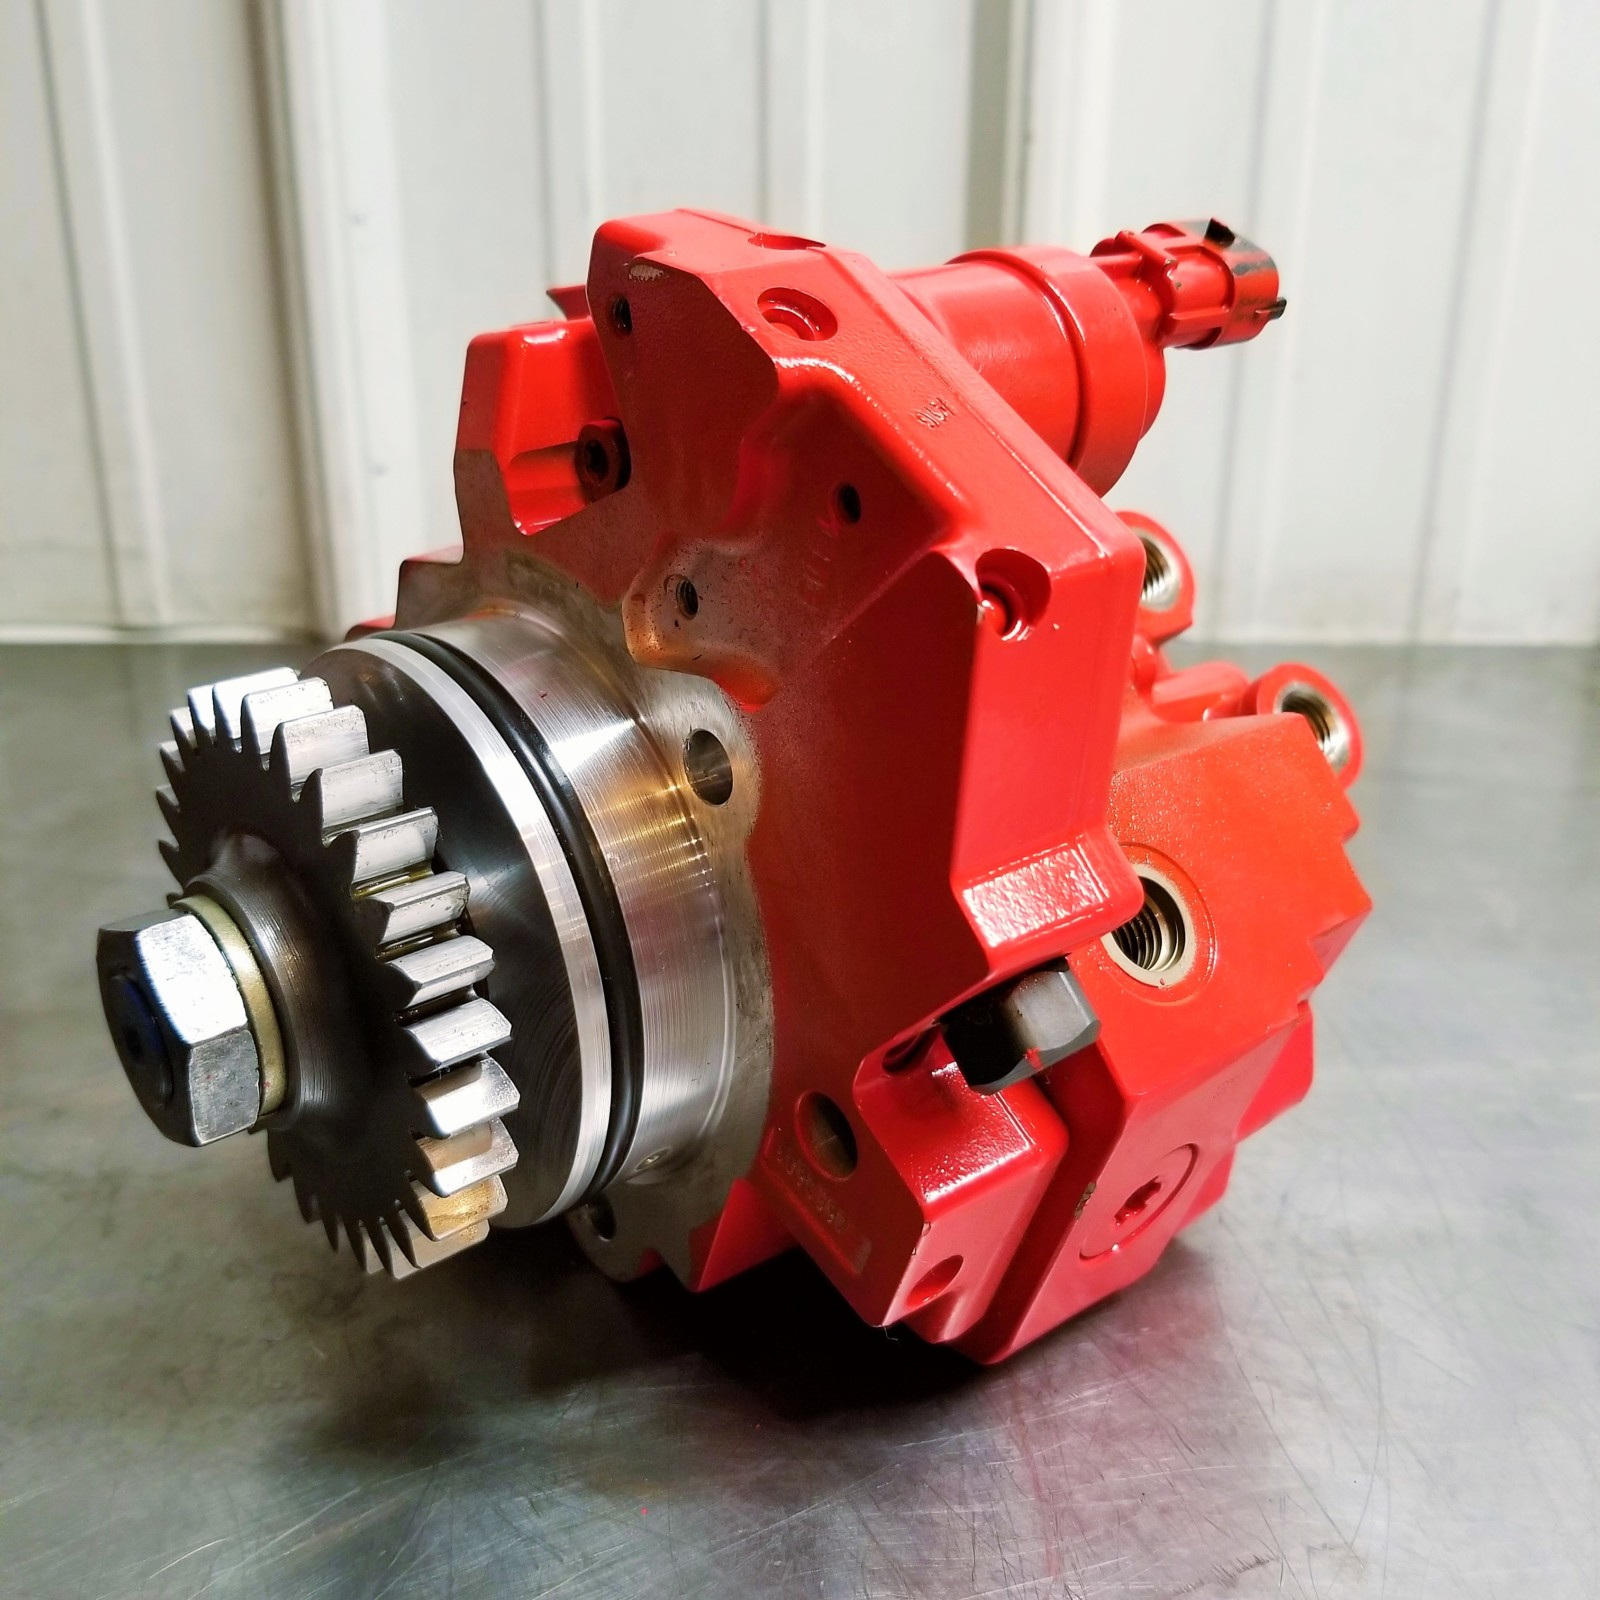 OEM Bosch CP3 Diesel Fuel Injector Pump For Cummins 6 7L - NEW GENUINE -  #3971529, 4982057, 4988595, 5264248, 2830800